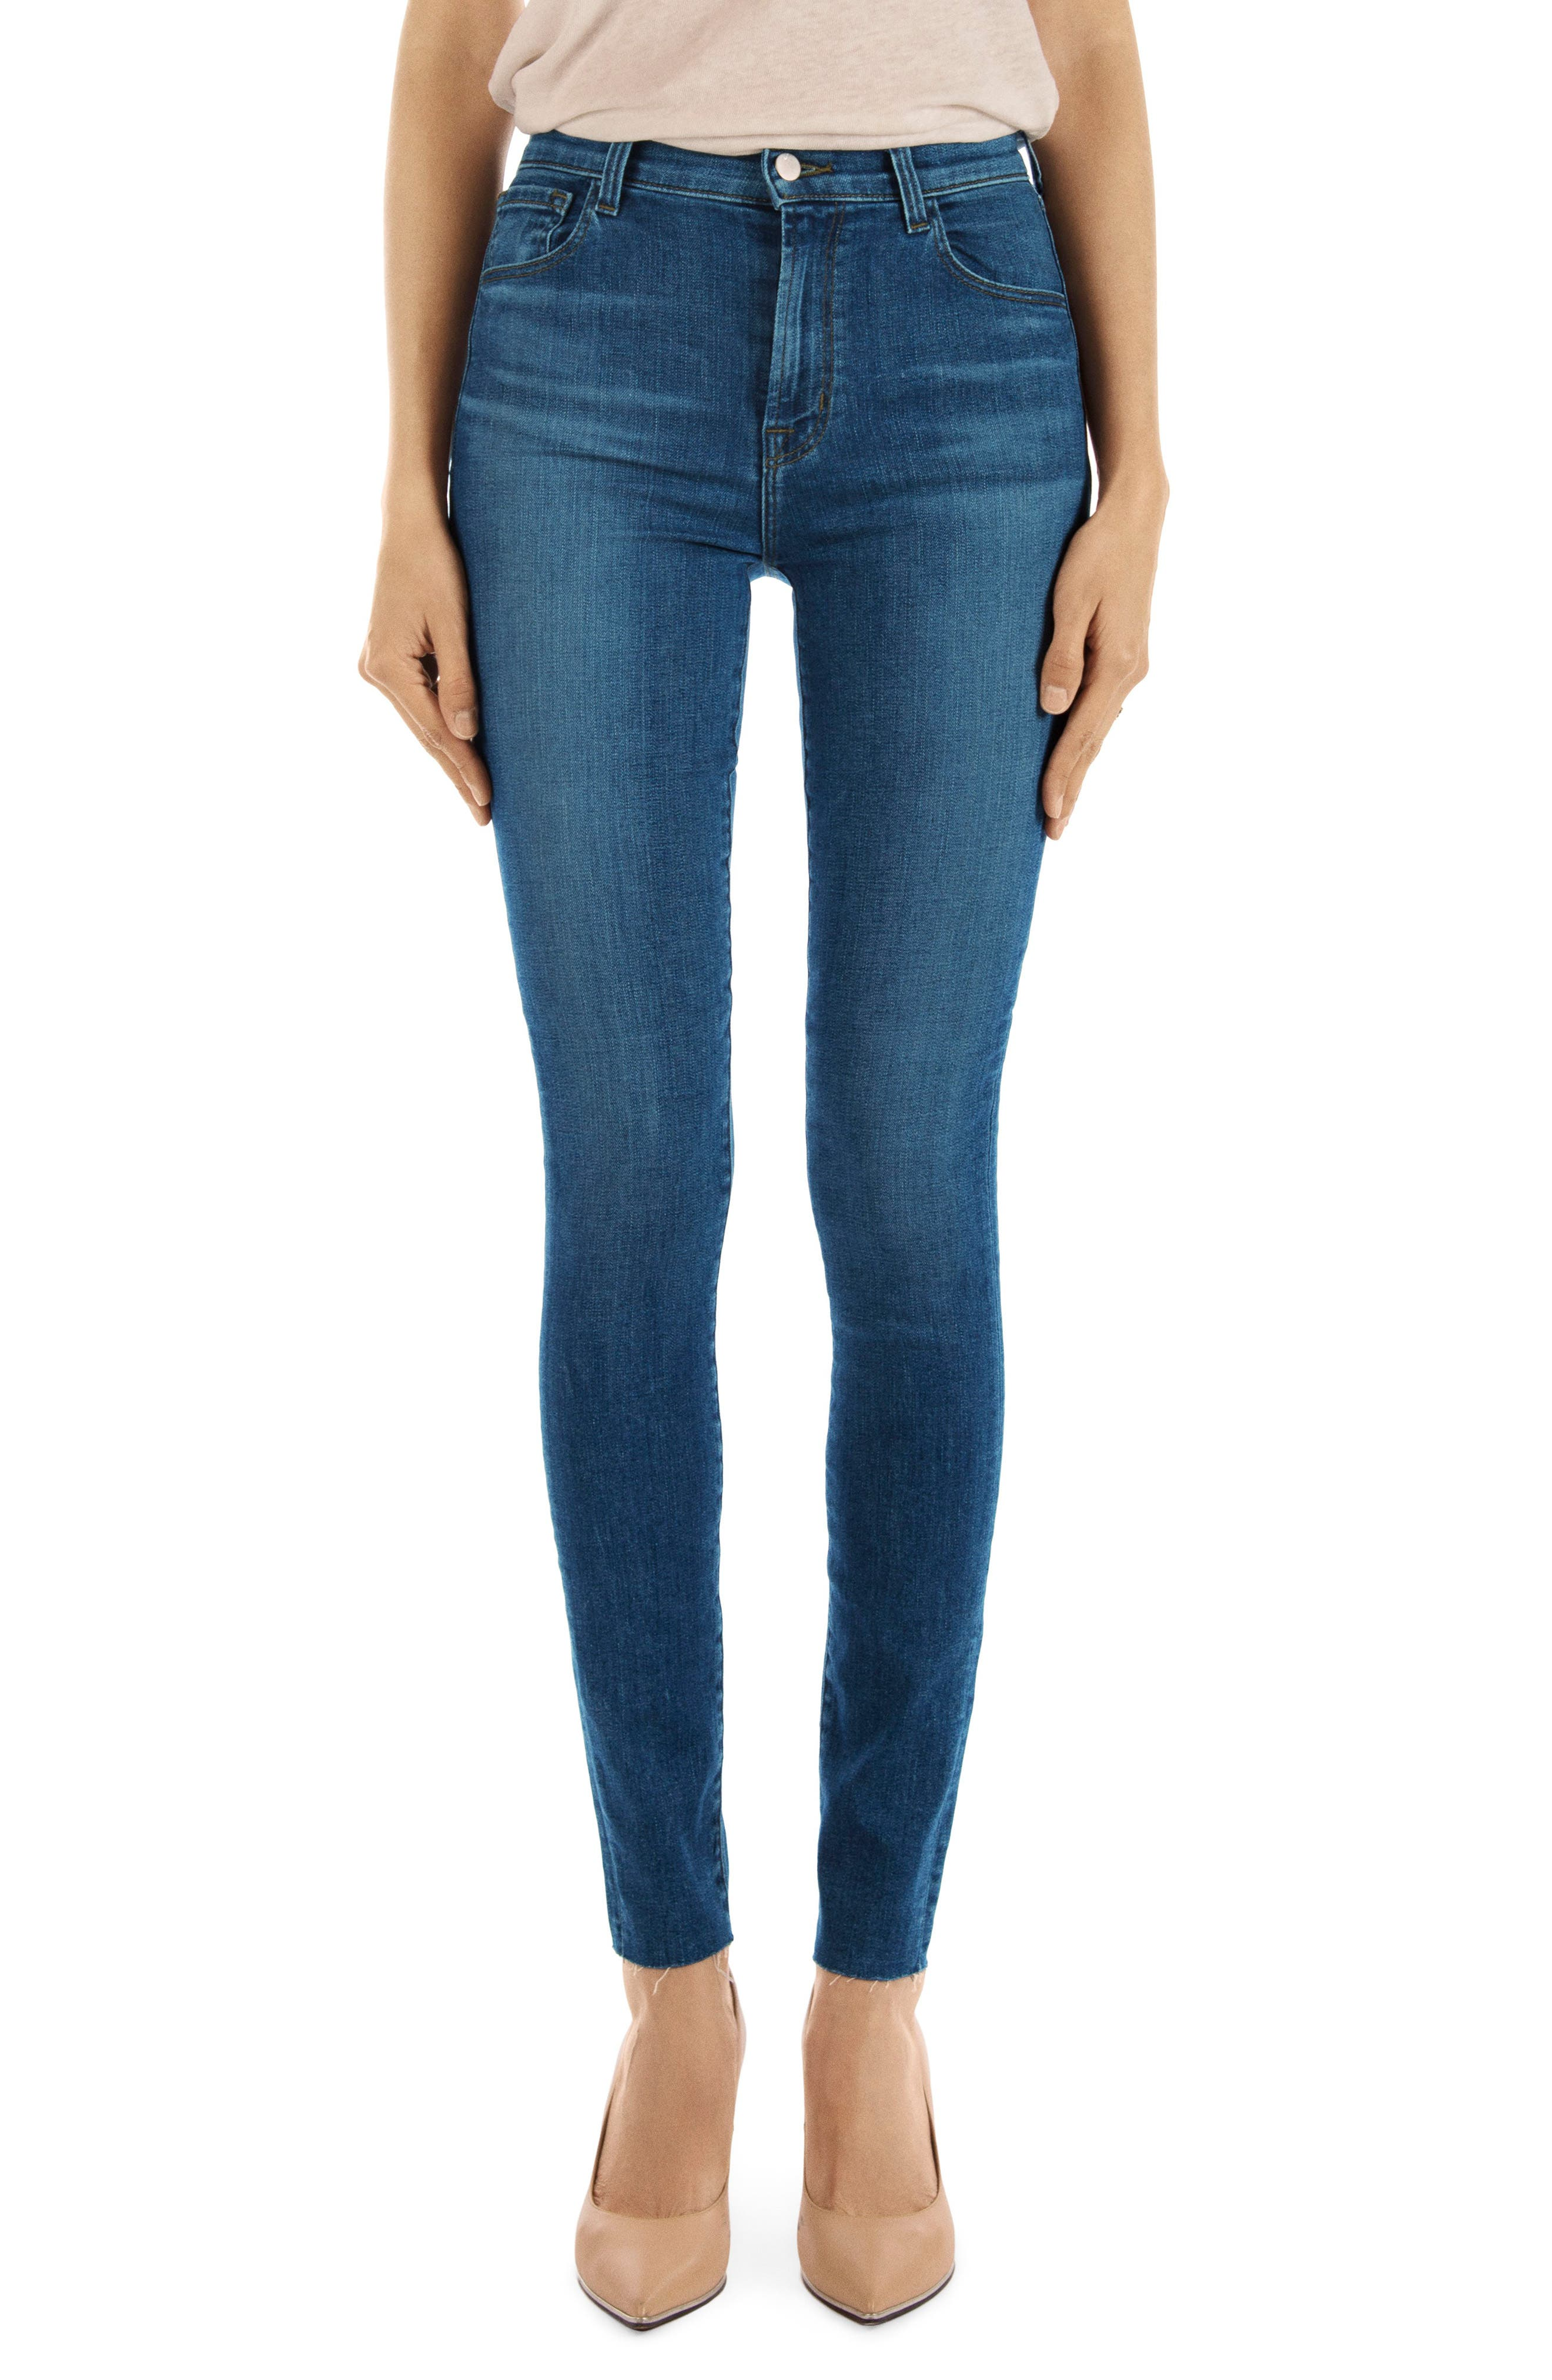 Carolina Super High Waist Skinny Jeans,                         Main,                         color, Lovesick